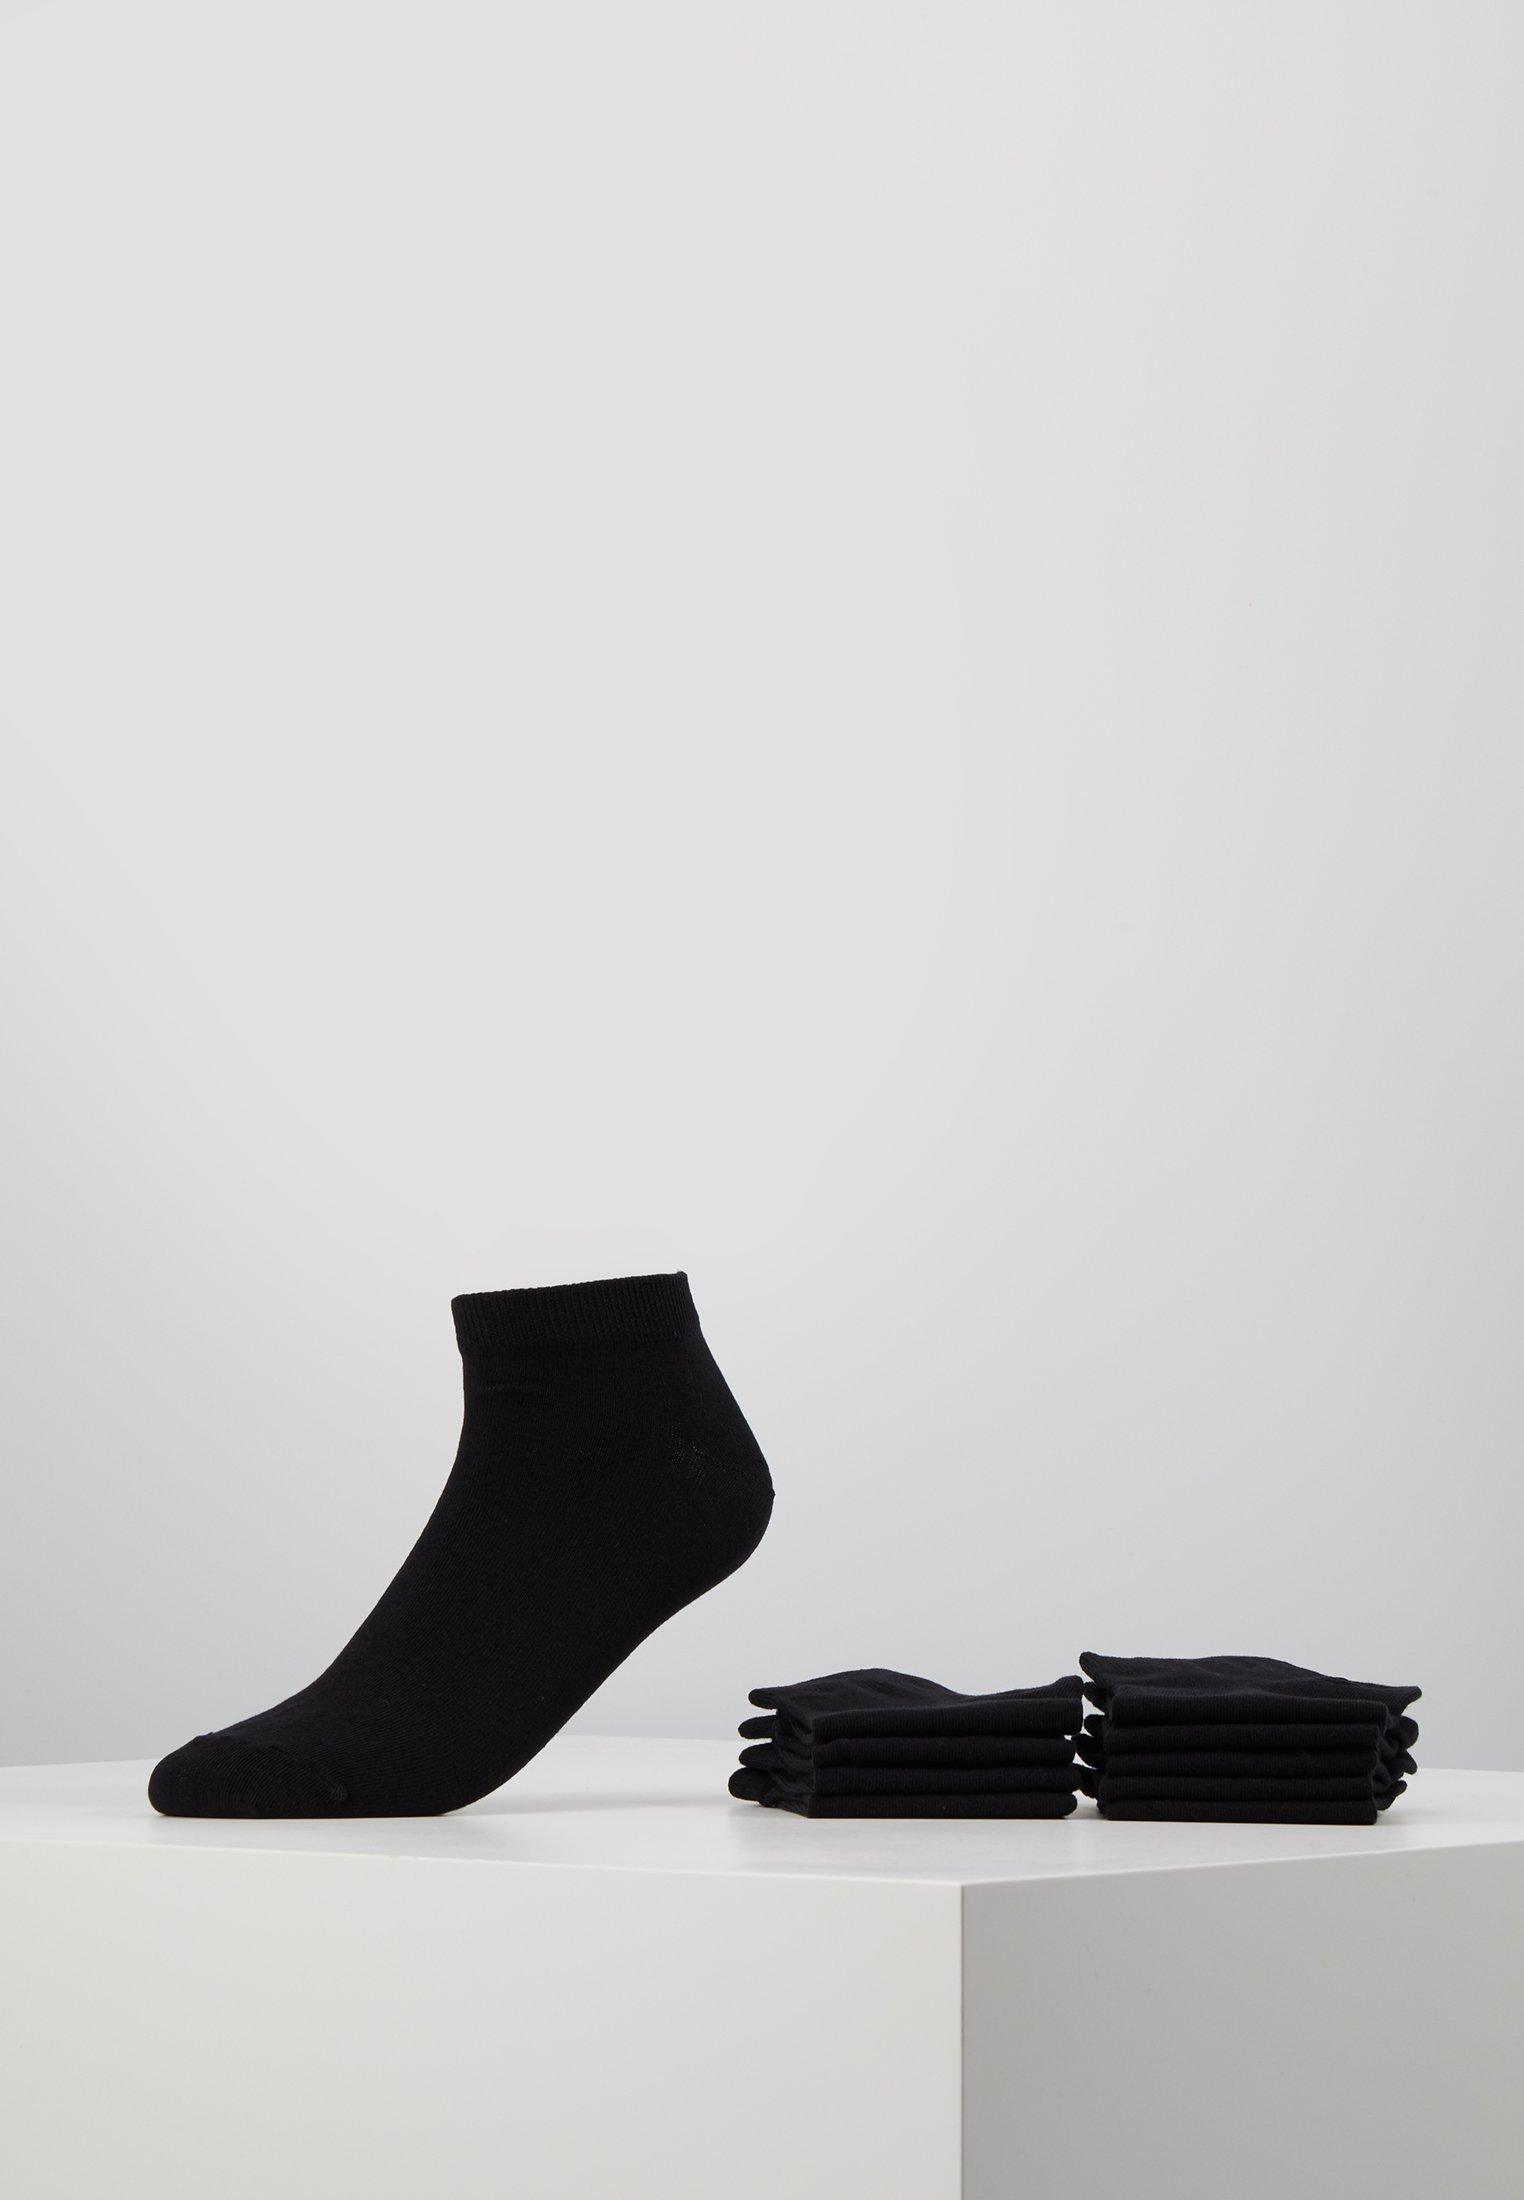 Men JACDONGO SOCKS 10 PACK - Socks - black/black